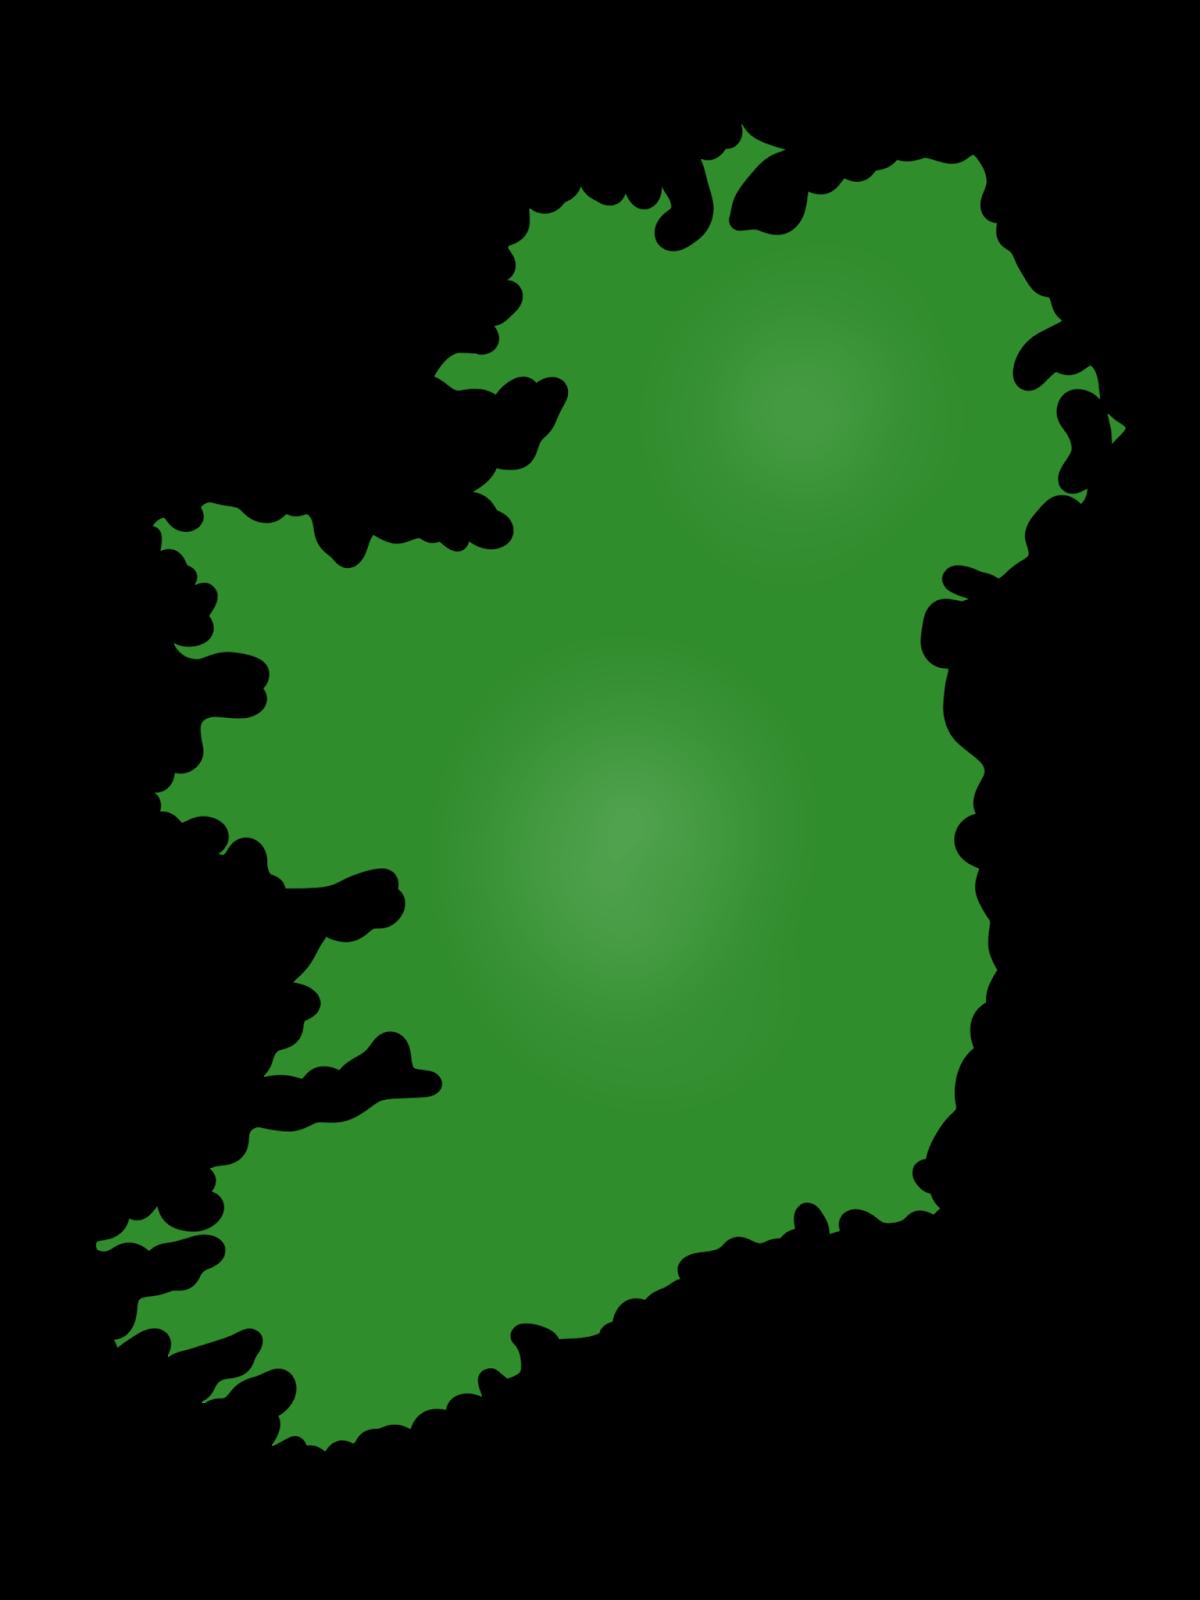 Europe at getdrawings com. Clipart map clip art